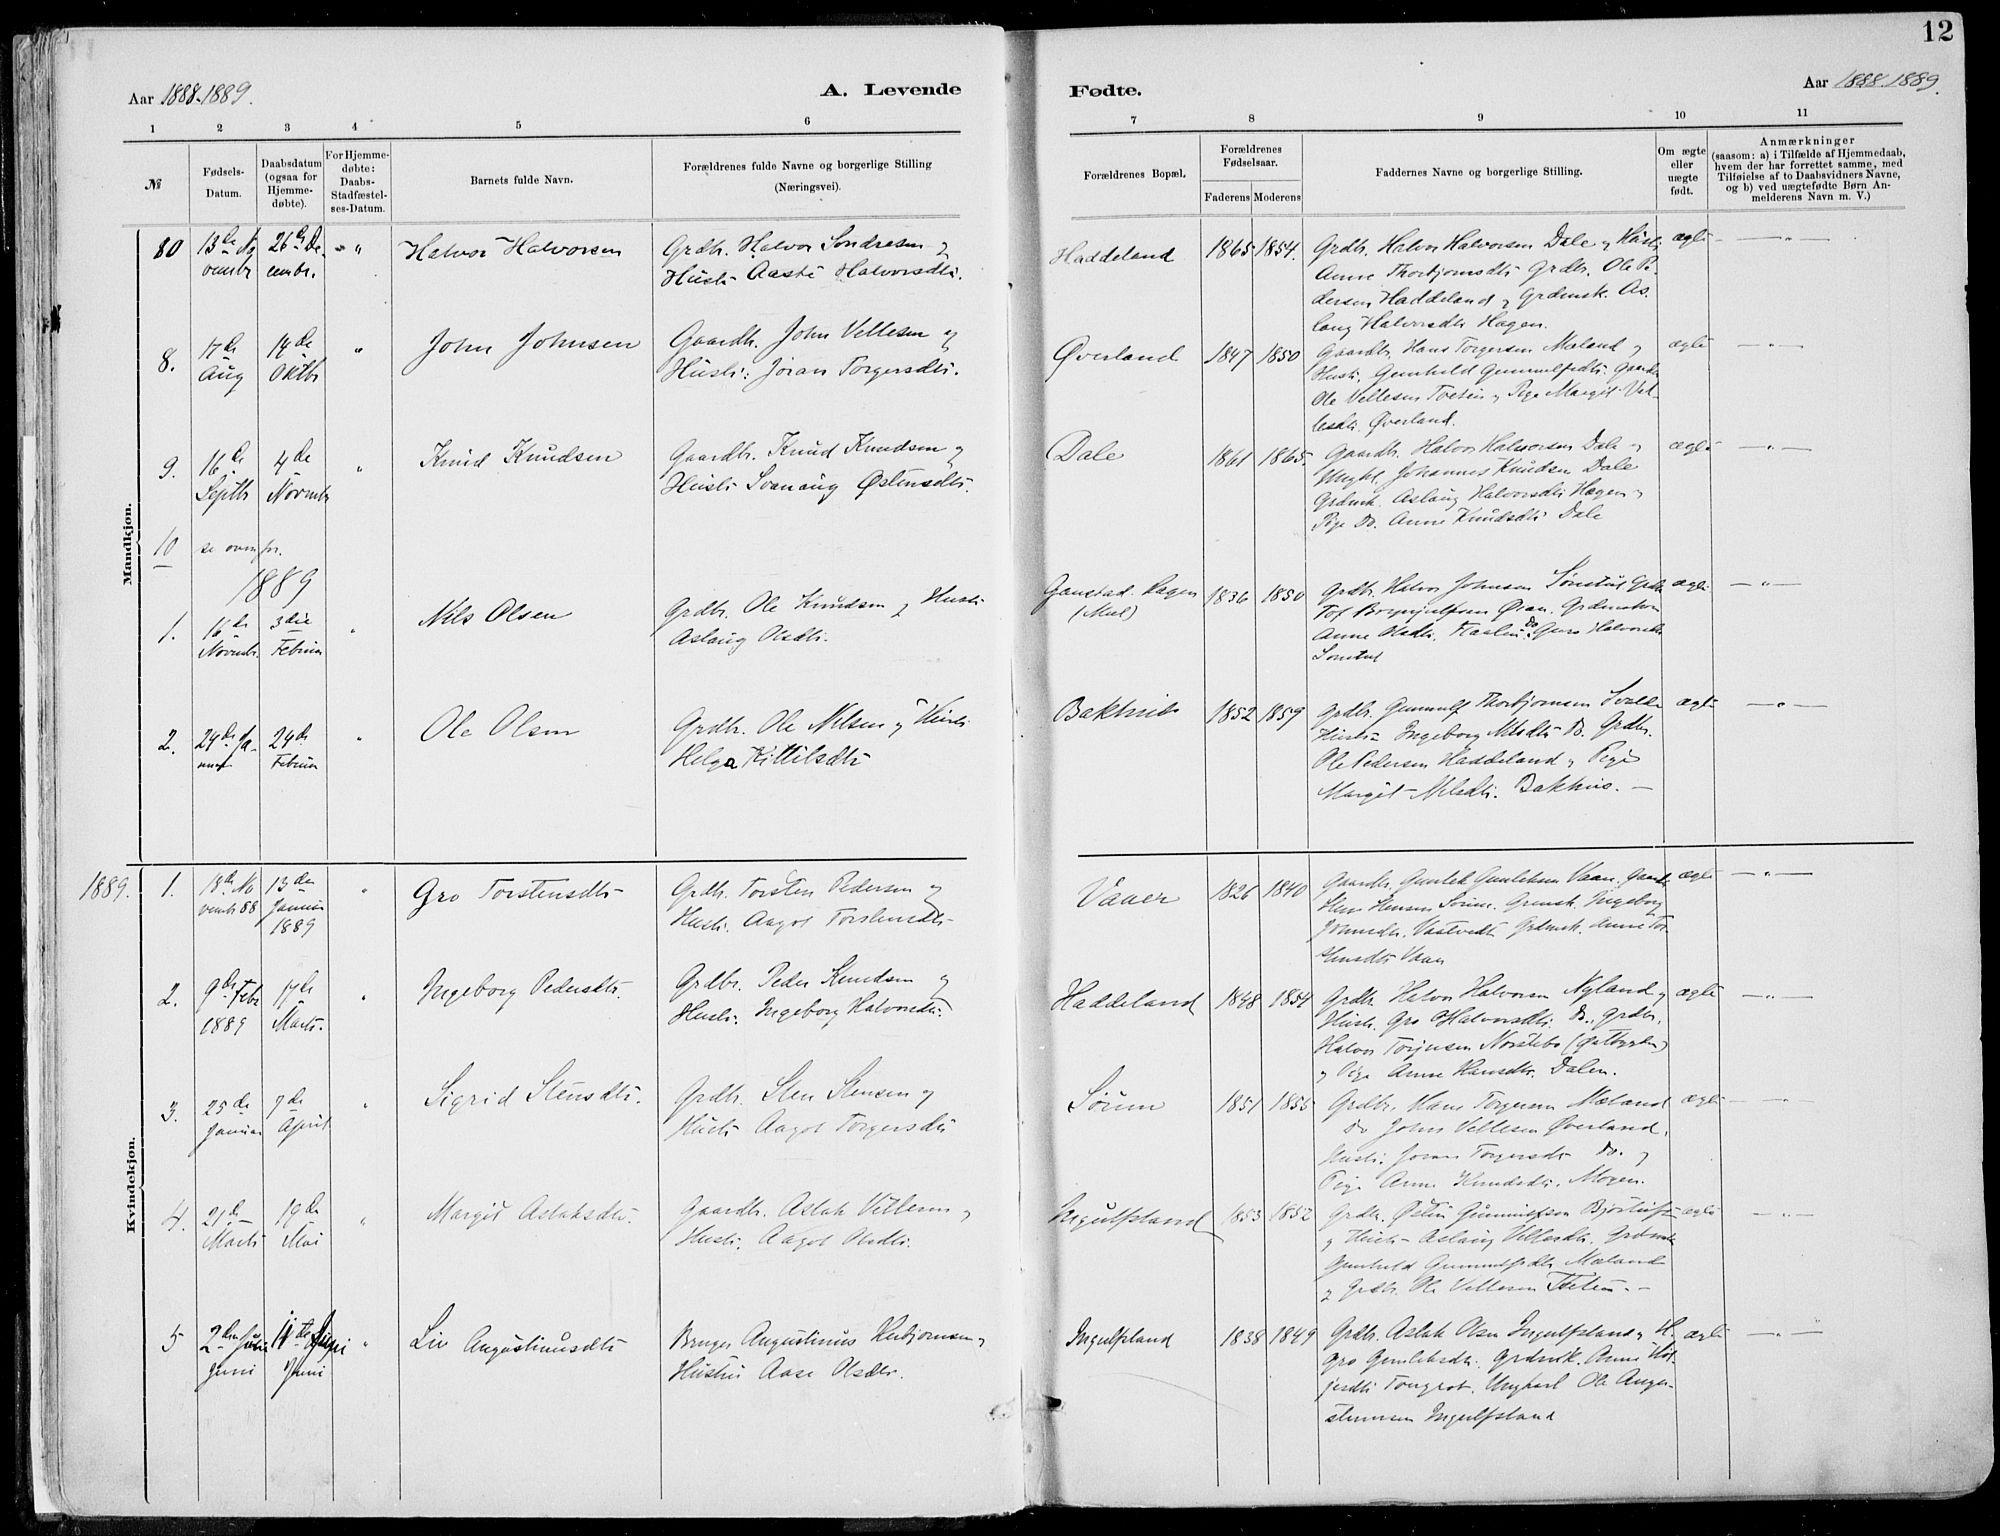 SAKO, Rjukan kirkebøker, F/Fa/L0001: Ministerialbok nr. 1, 1878-1912, s. 12